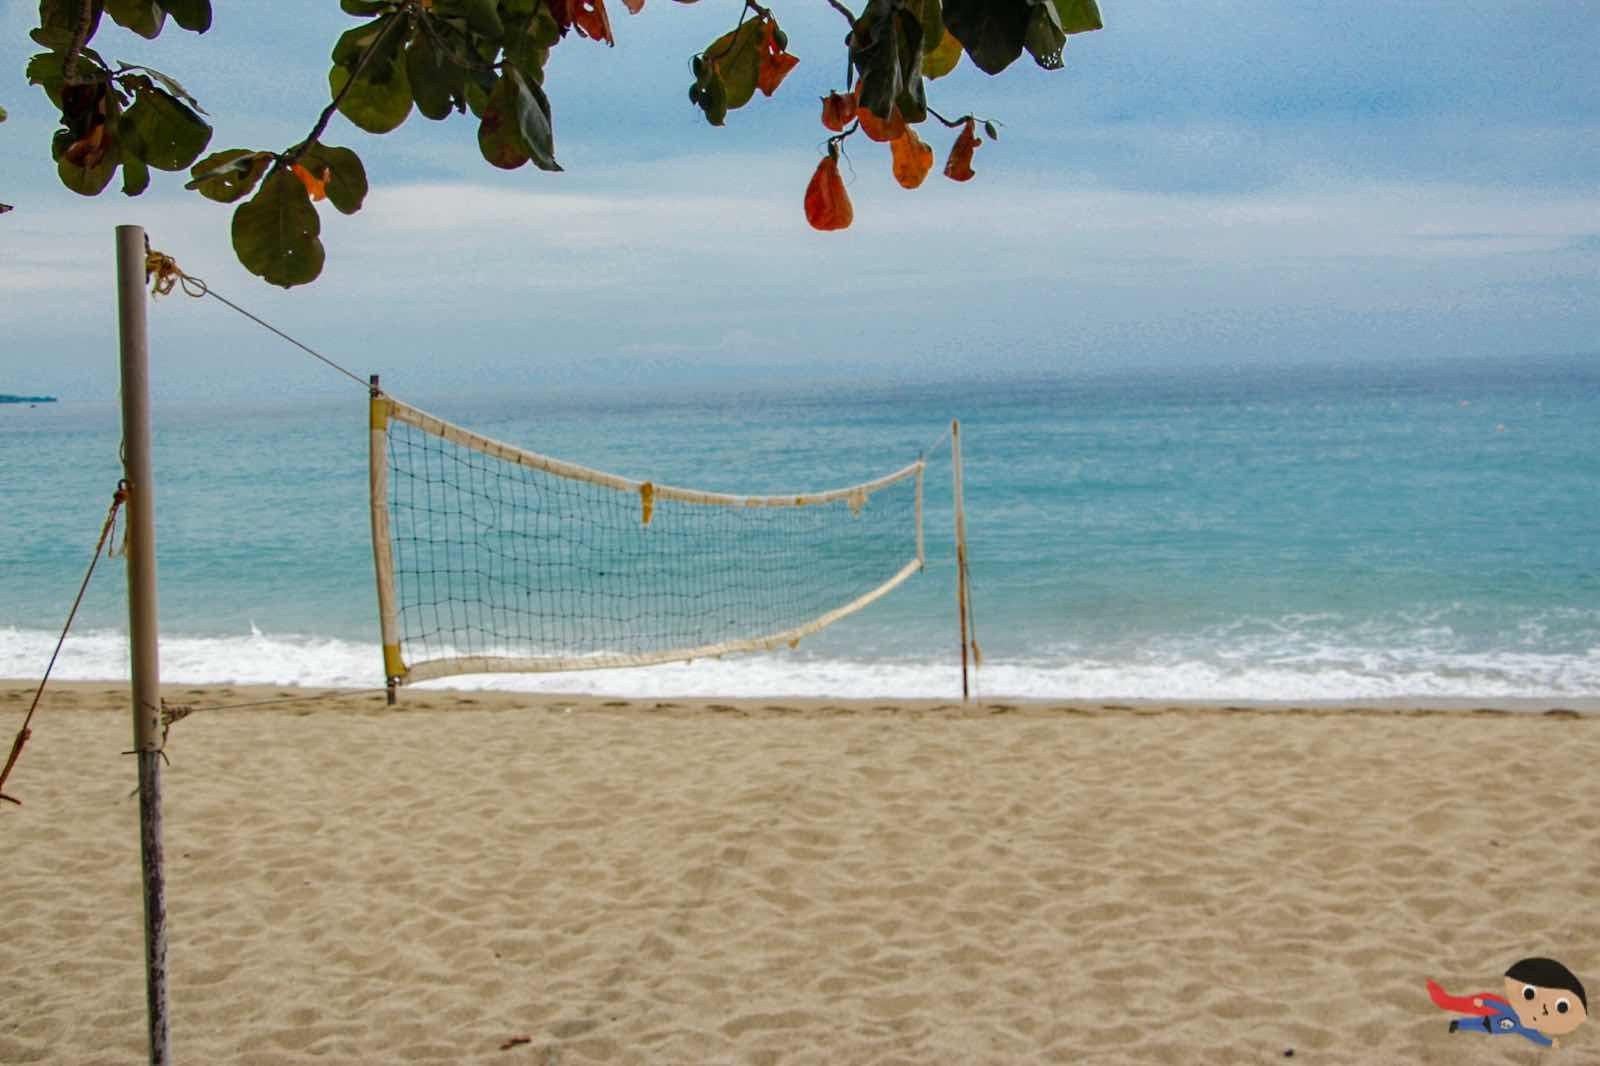 Beach volleyball in La Luz Resort, San Juan, Batangas